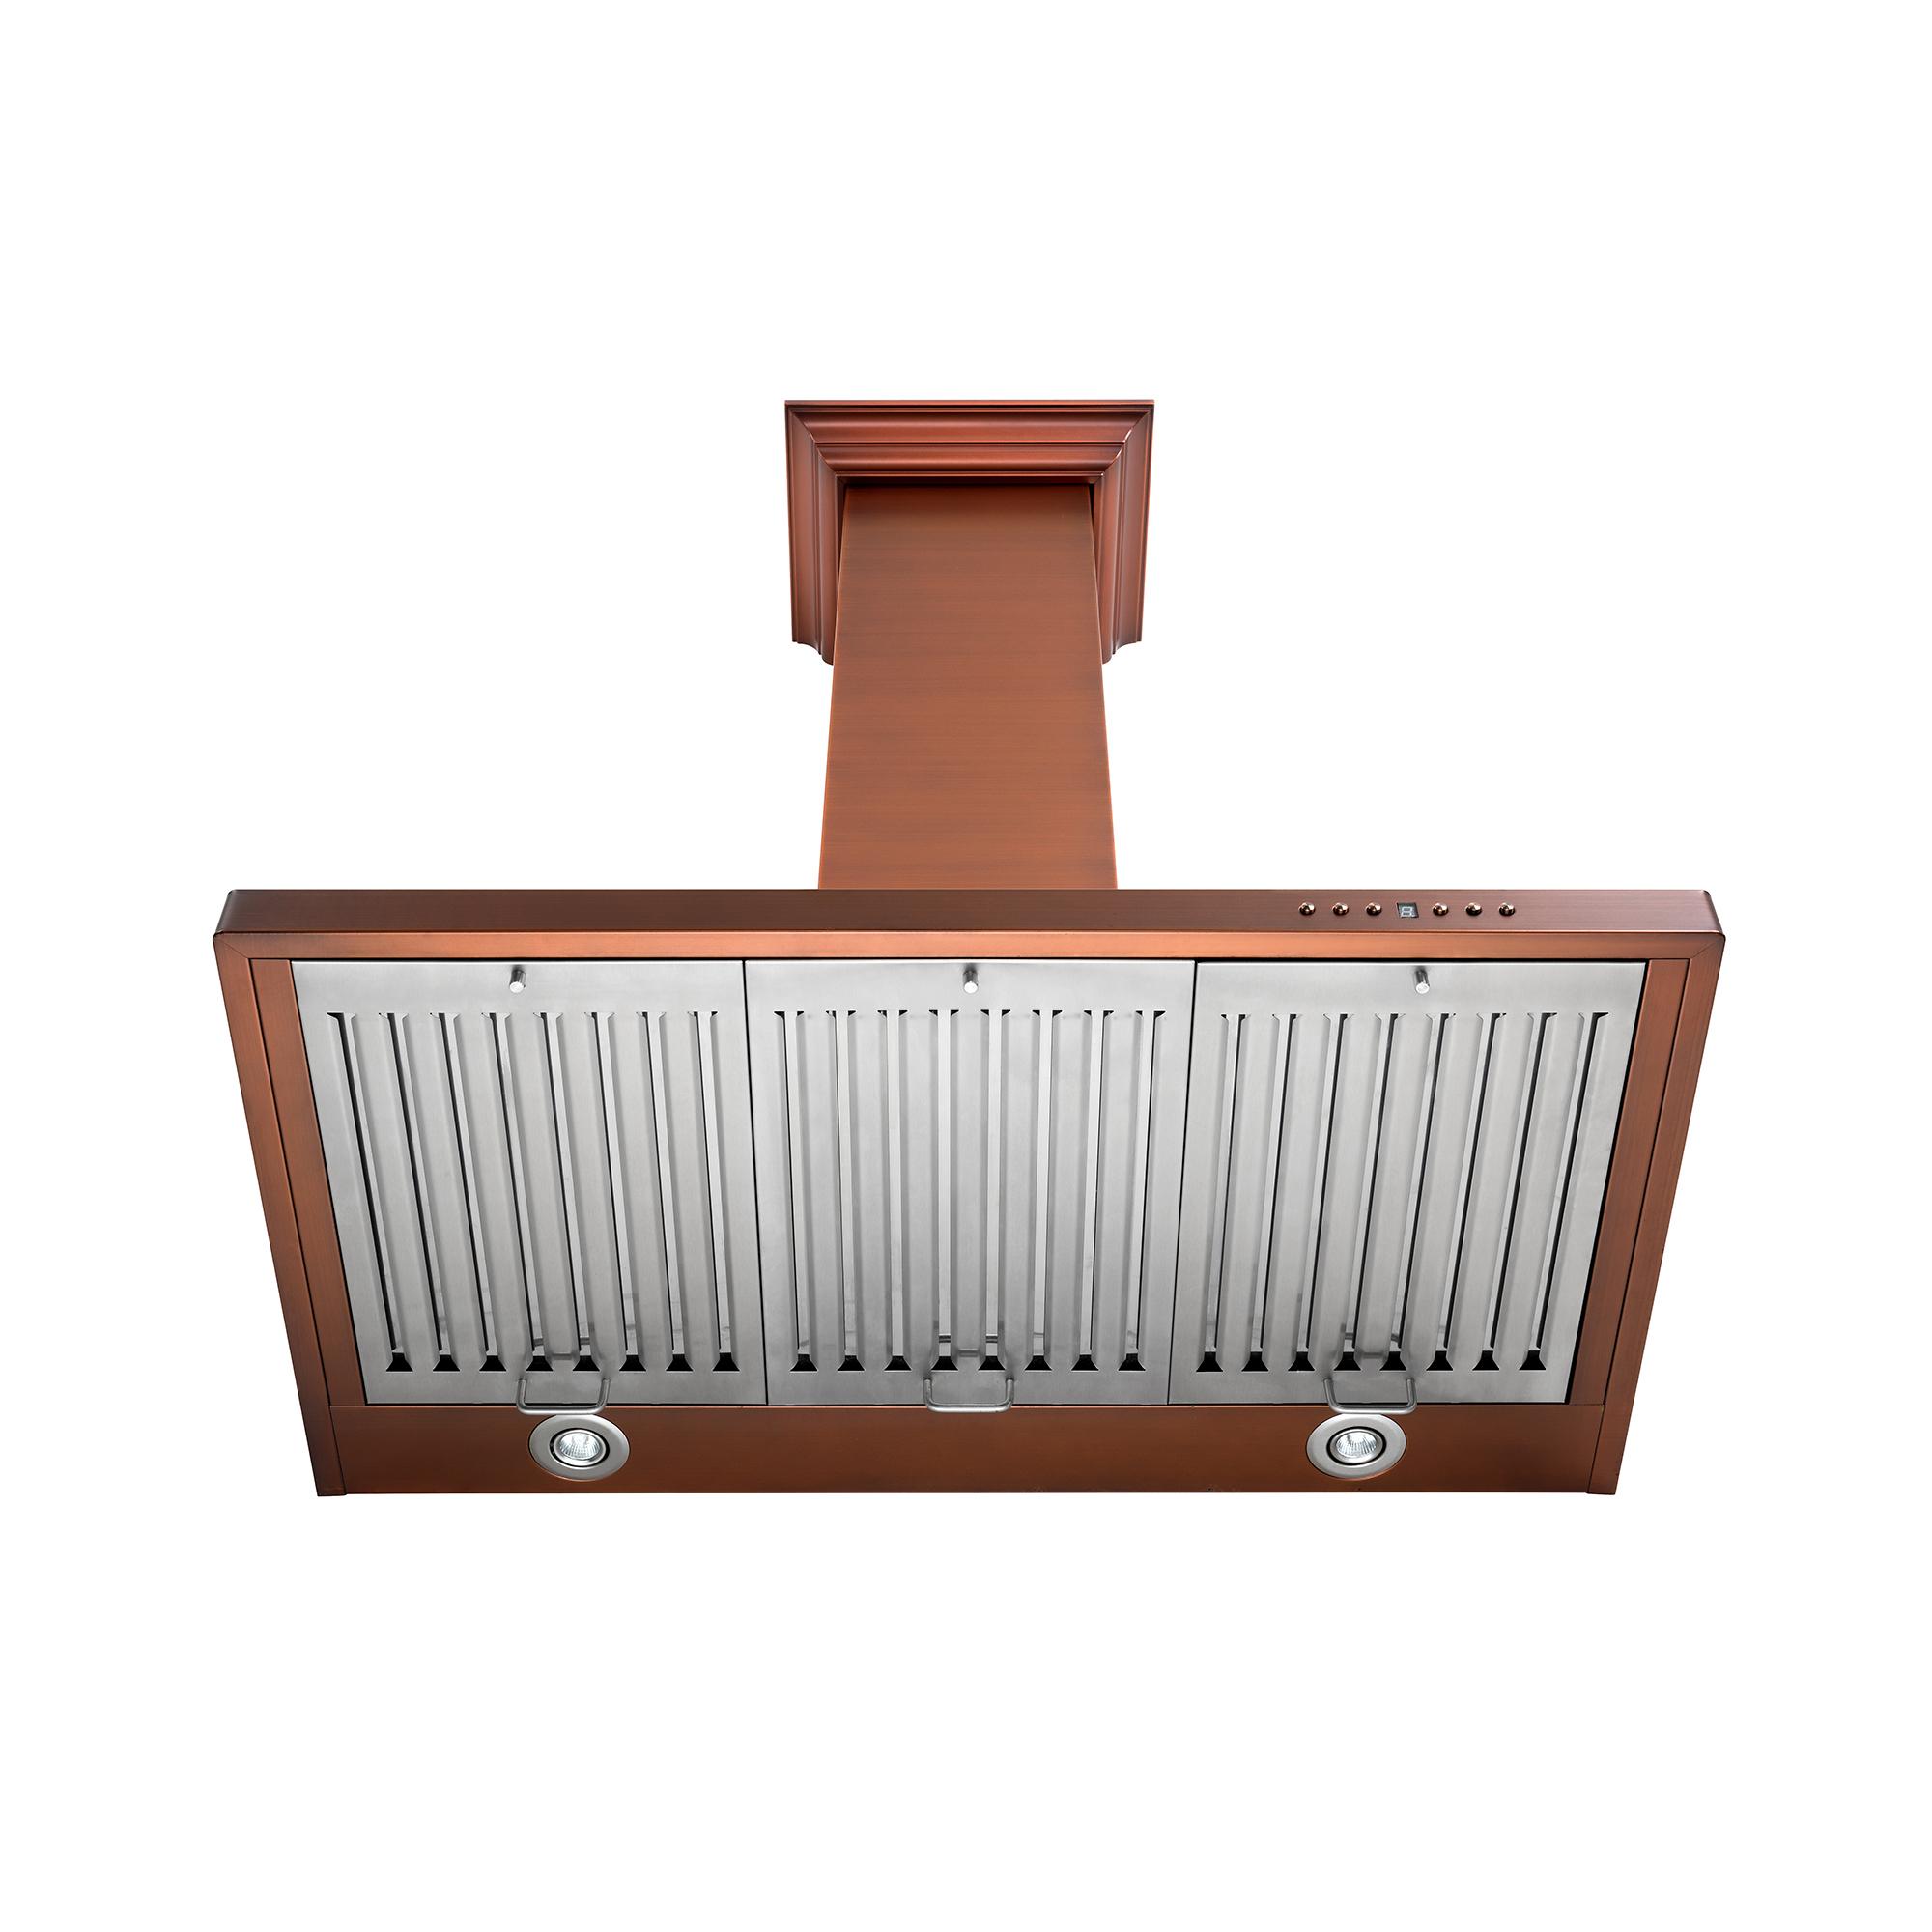 zline-copper-wall-mounted-range-hood-8KBC-under.jpg